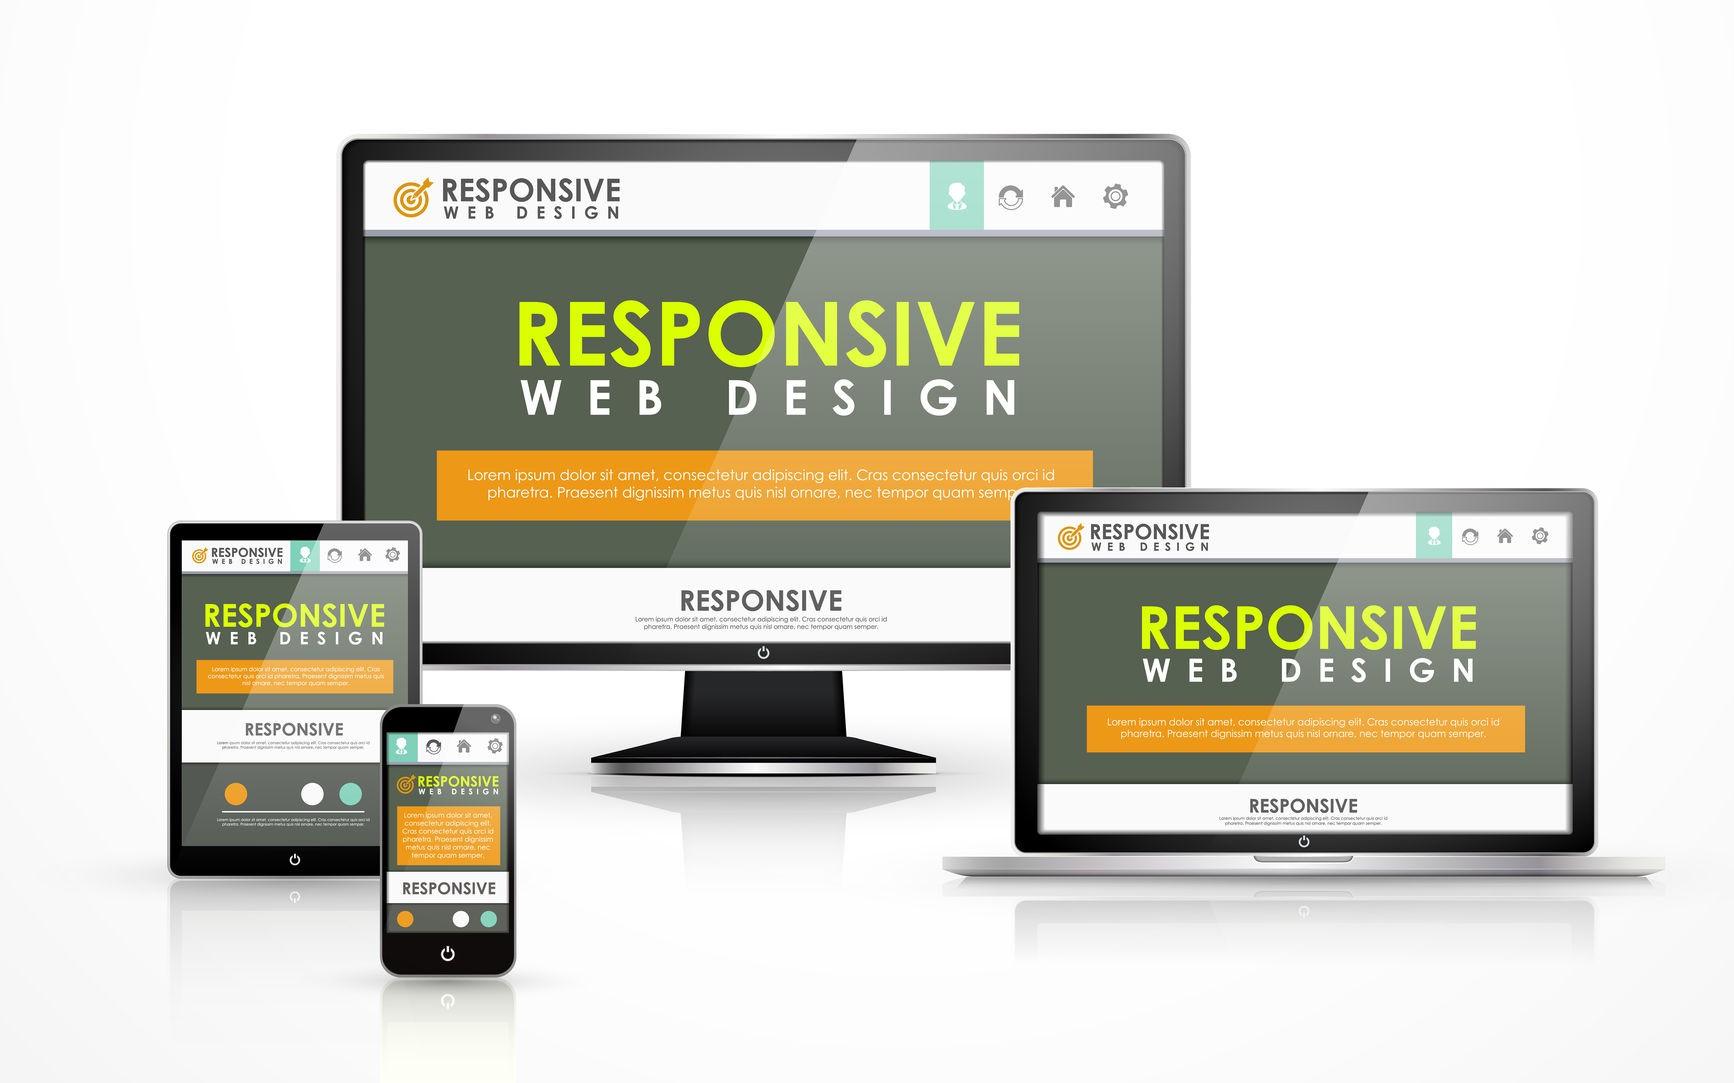 10 Great Benefits of Responsive Web Design